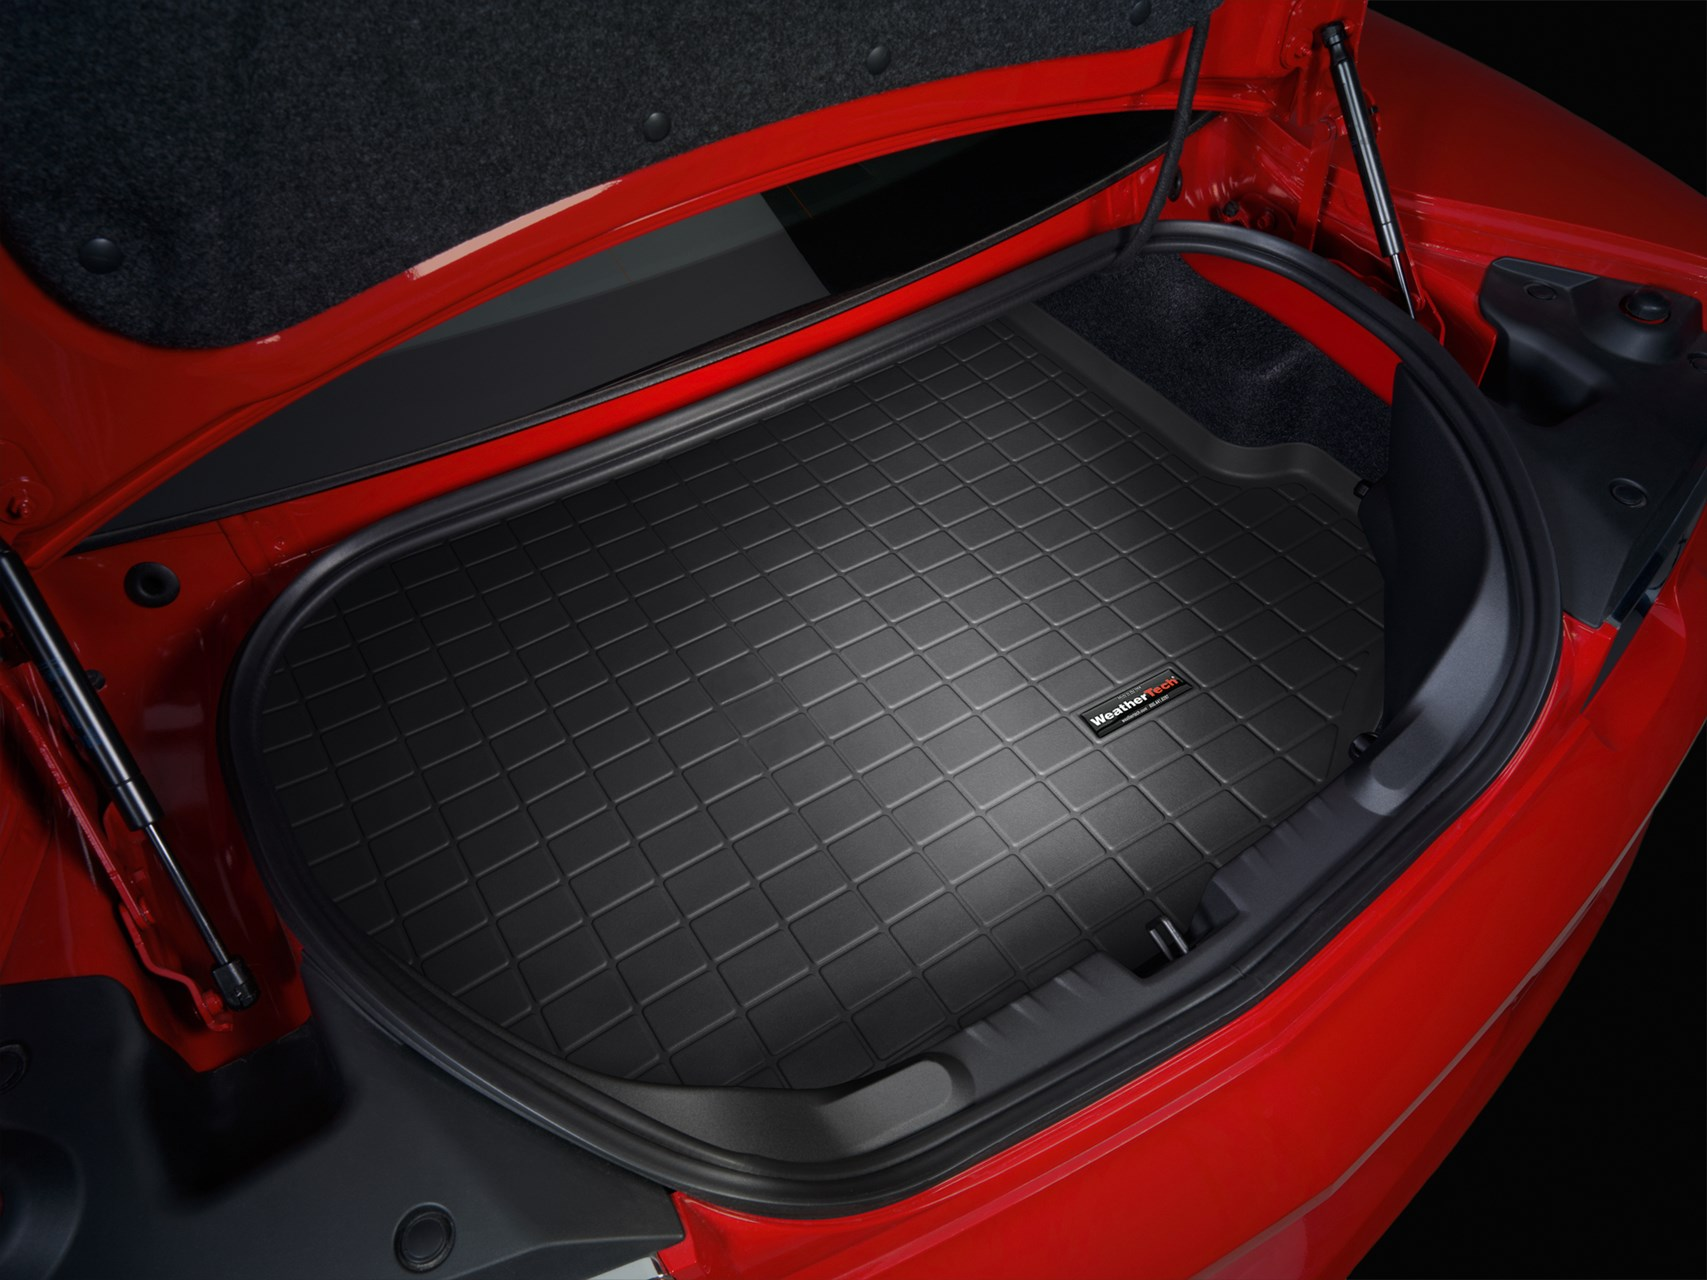 Weathertech mats for 2013 toyota highlander - 2003 Toyota 4runner Cargo Mat And Trunk Liner For Cars Suvs And Minivans Weathertech Com